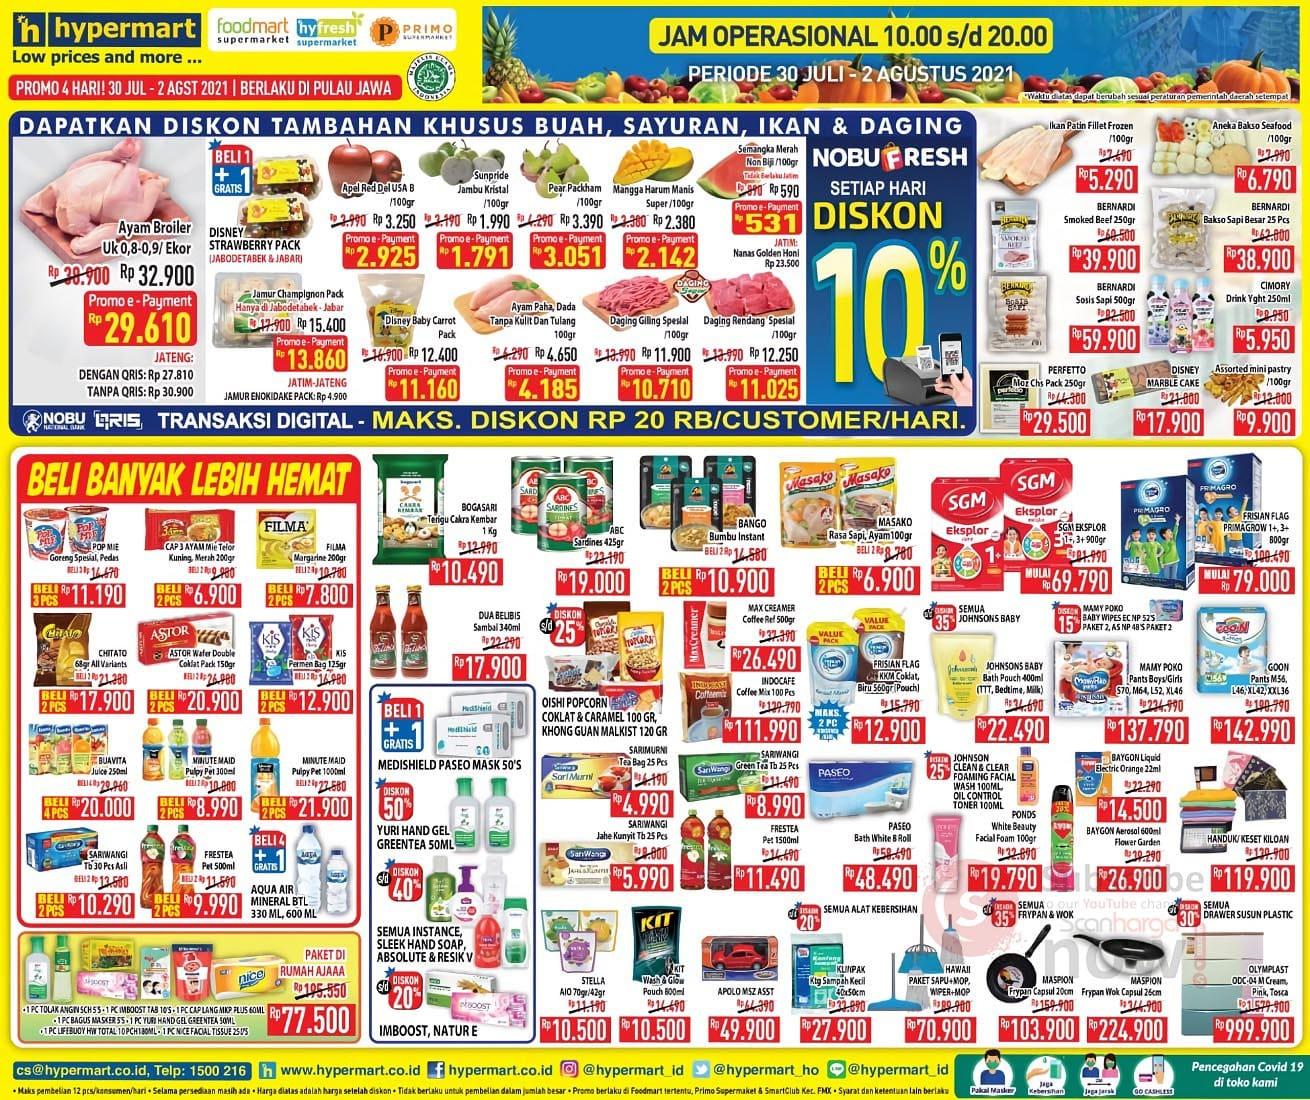 Katalog Promo Hypermart Weekend 30 Juli - 2 Agustus 2021 1